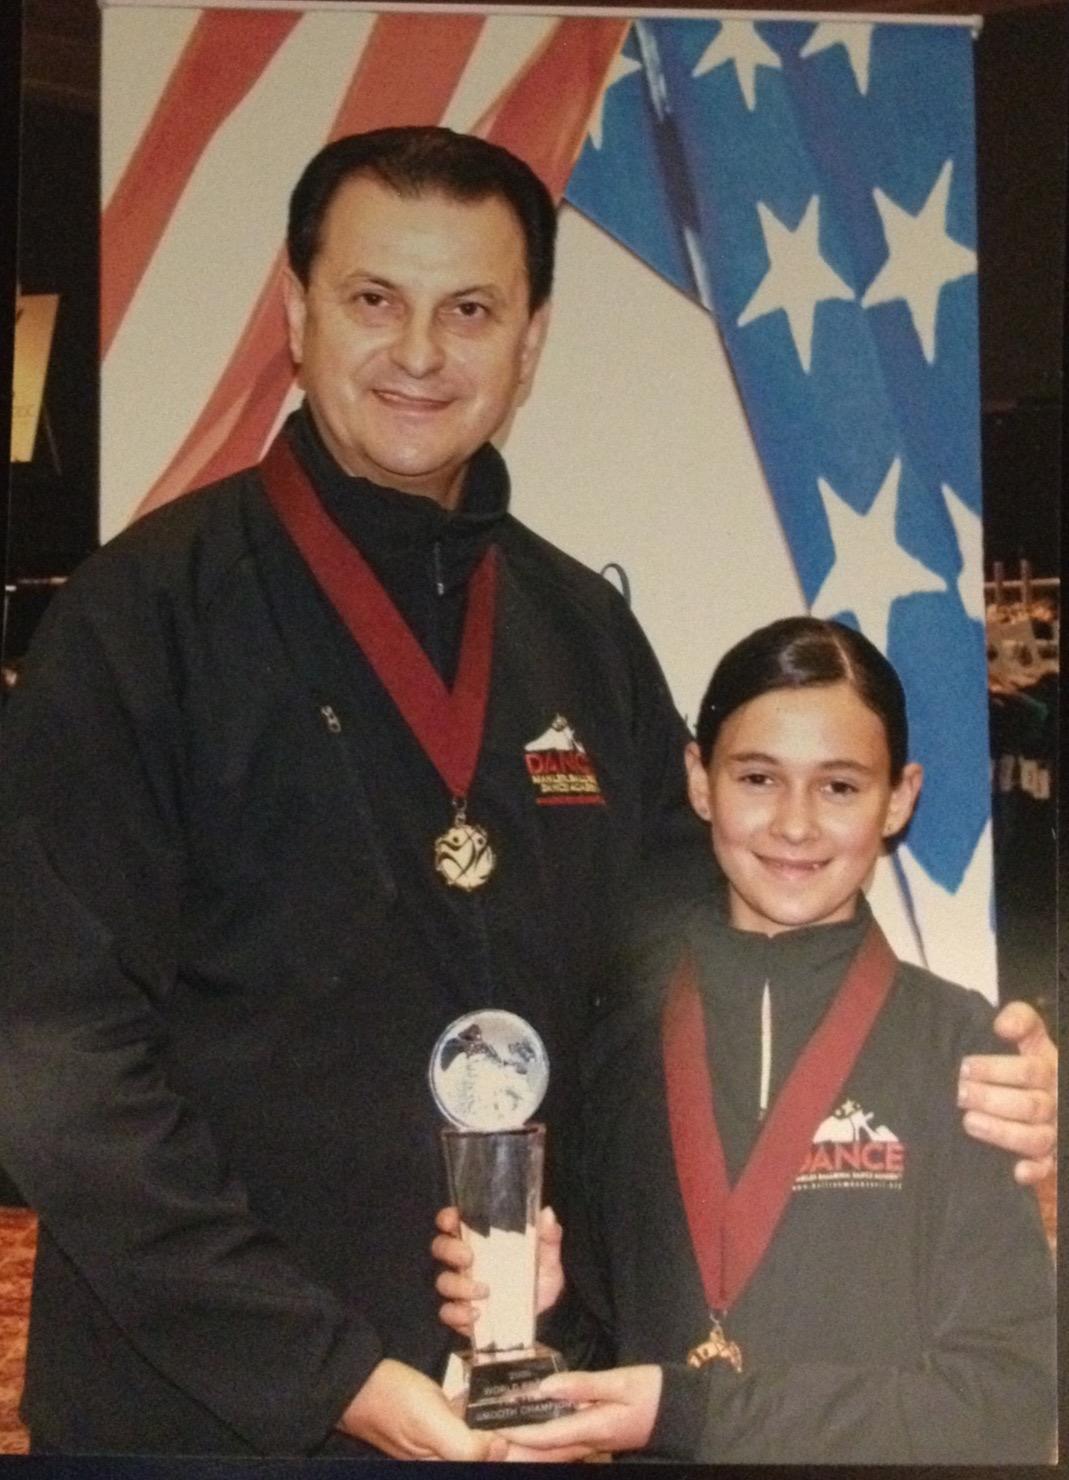 Vassily Lyashenko & Valerie Pelts  2009 World Pro-Am Preteen Champion Ballroom Dance Hall of Fame, Columbus, OH